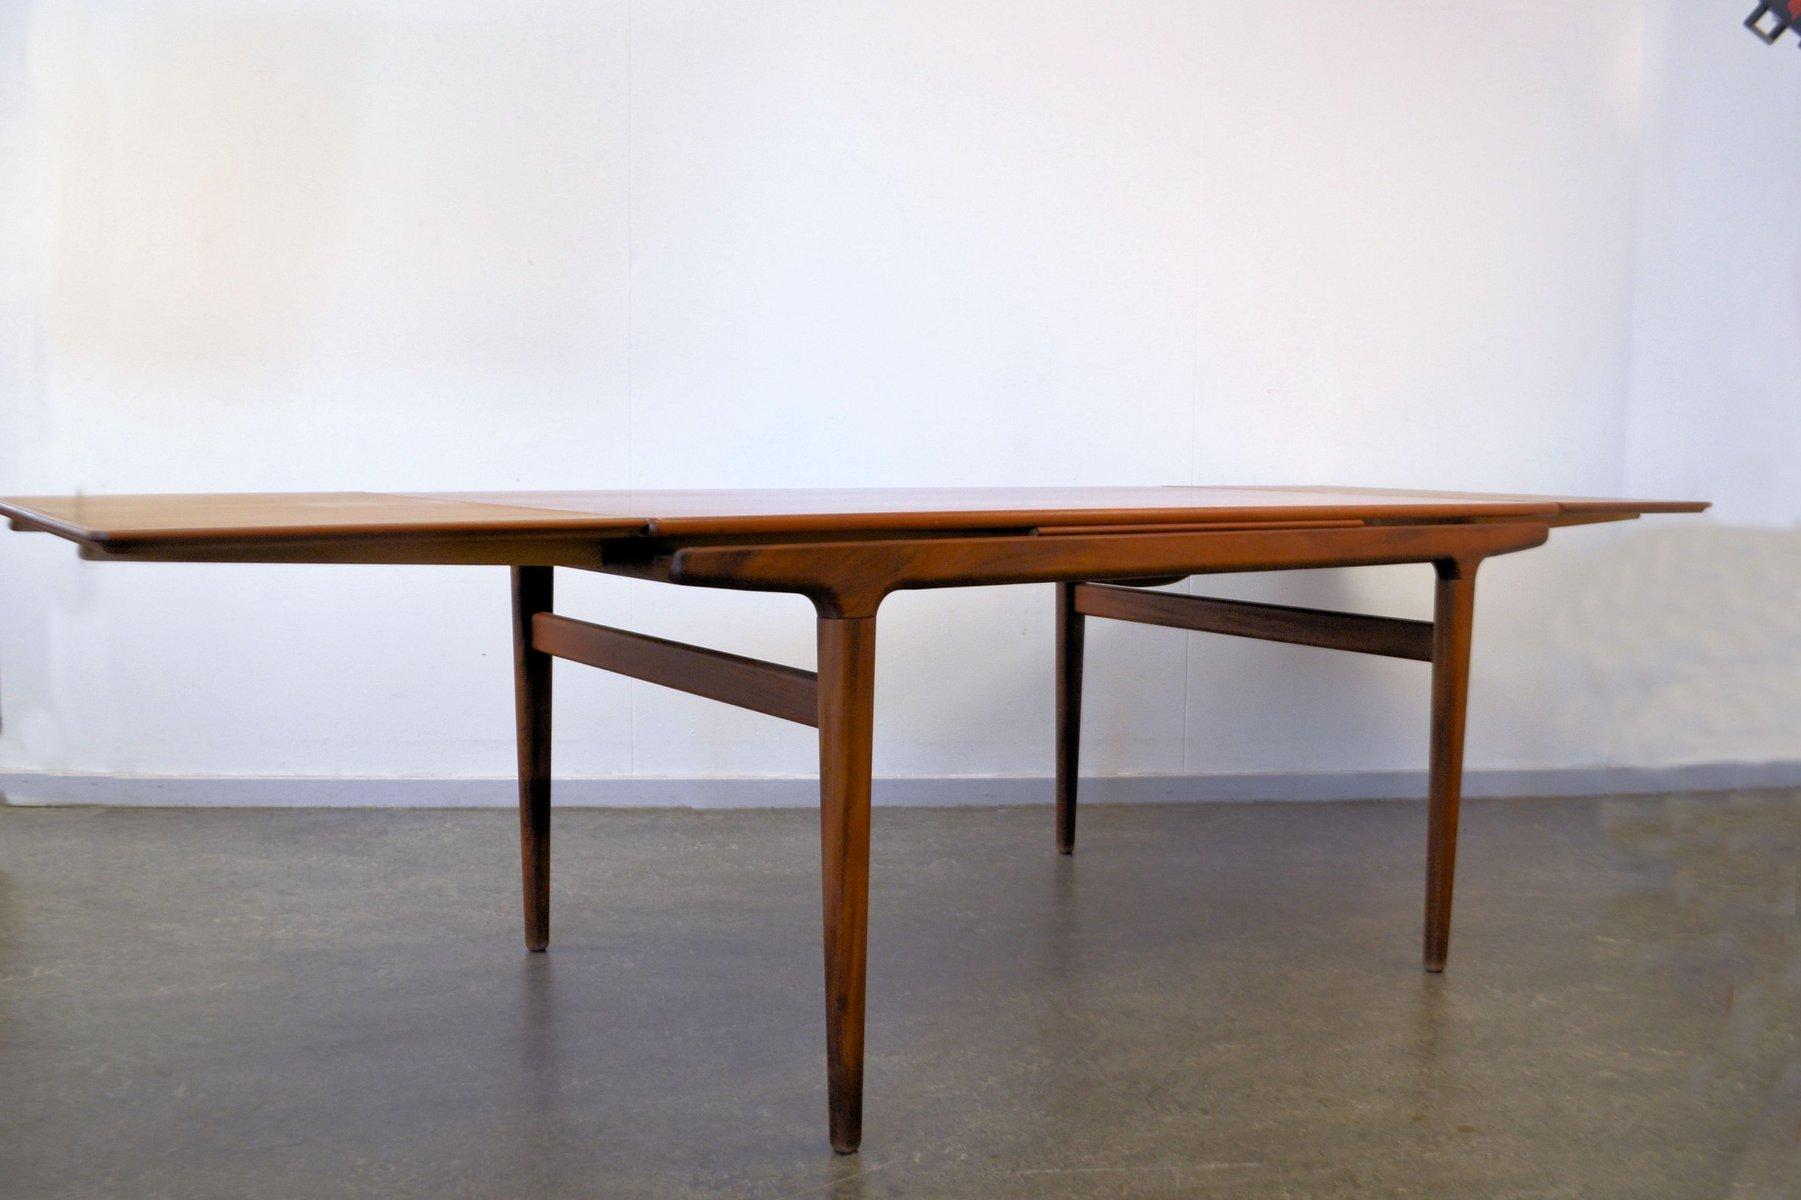 Vintage Danish Teak Dining Table by Johannes Andersen for  : vintage danish teak dining table by johannes andersen for udlum mobelfabrik 7 from www.pamono.co.uk size 1801 x 1200 jpeg 95kB